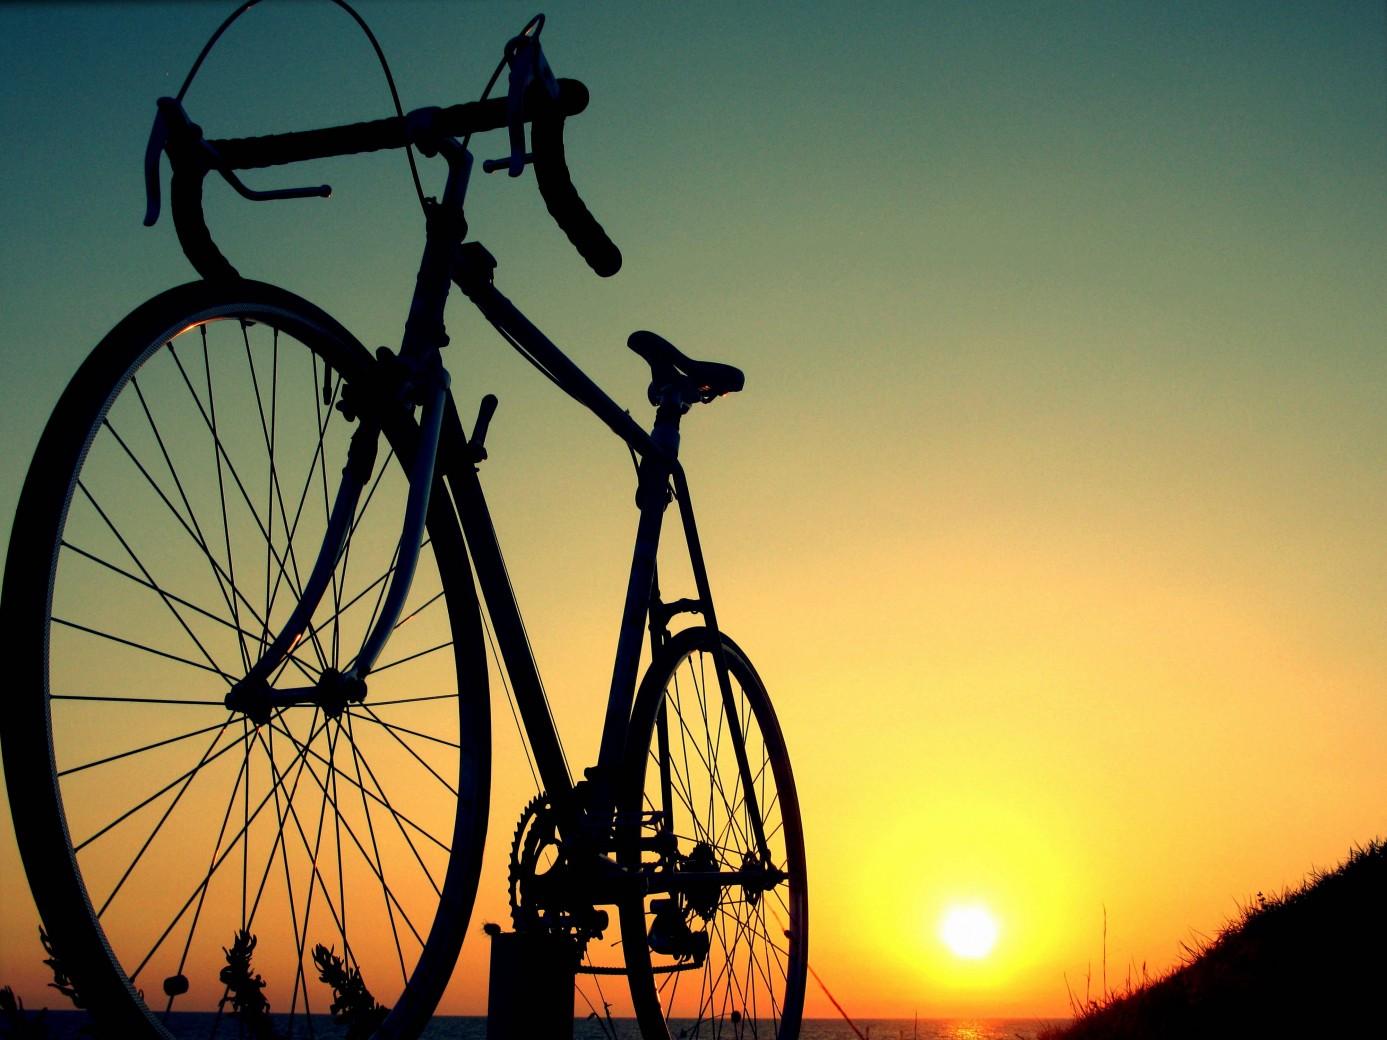 preparacion-rodar-ciclismo-calor/